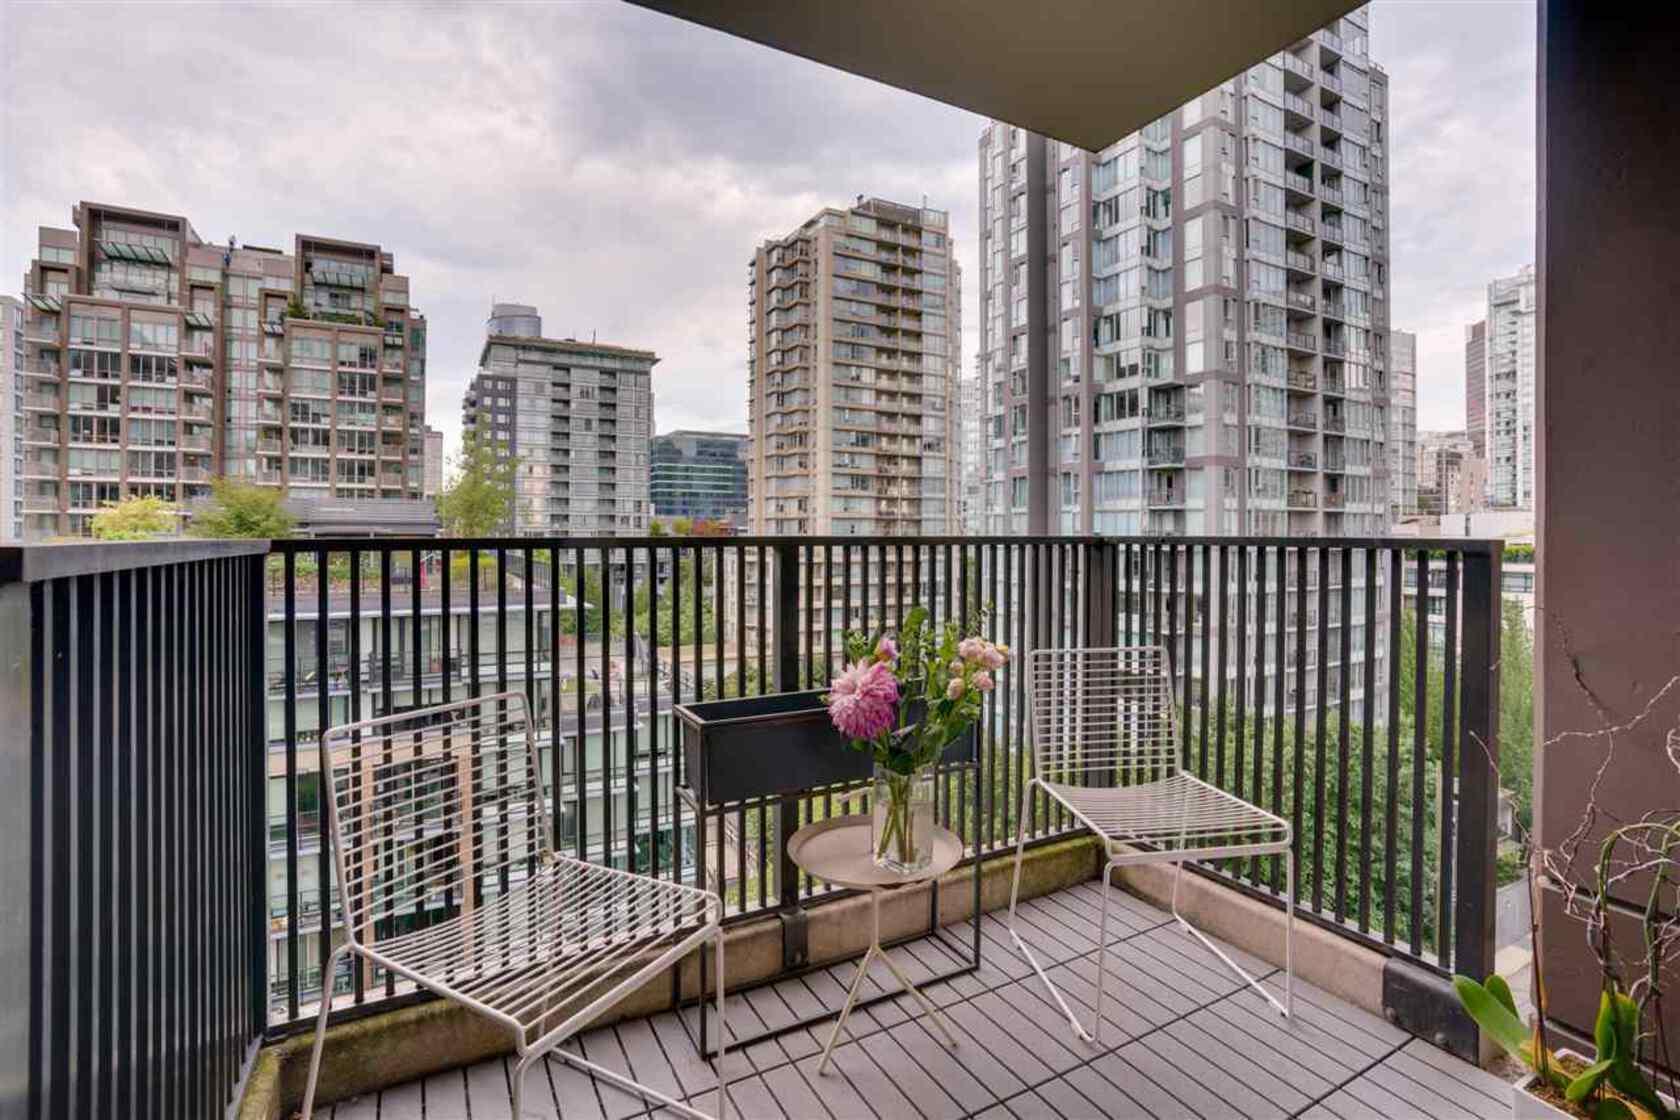 1055-homer-street-yaletown-vancouver-west-08 at 1105 - 1055 Homer Street, Yaletown, Vancouver West